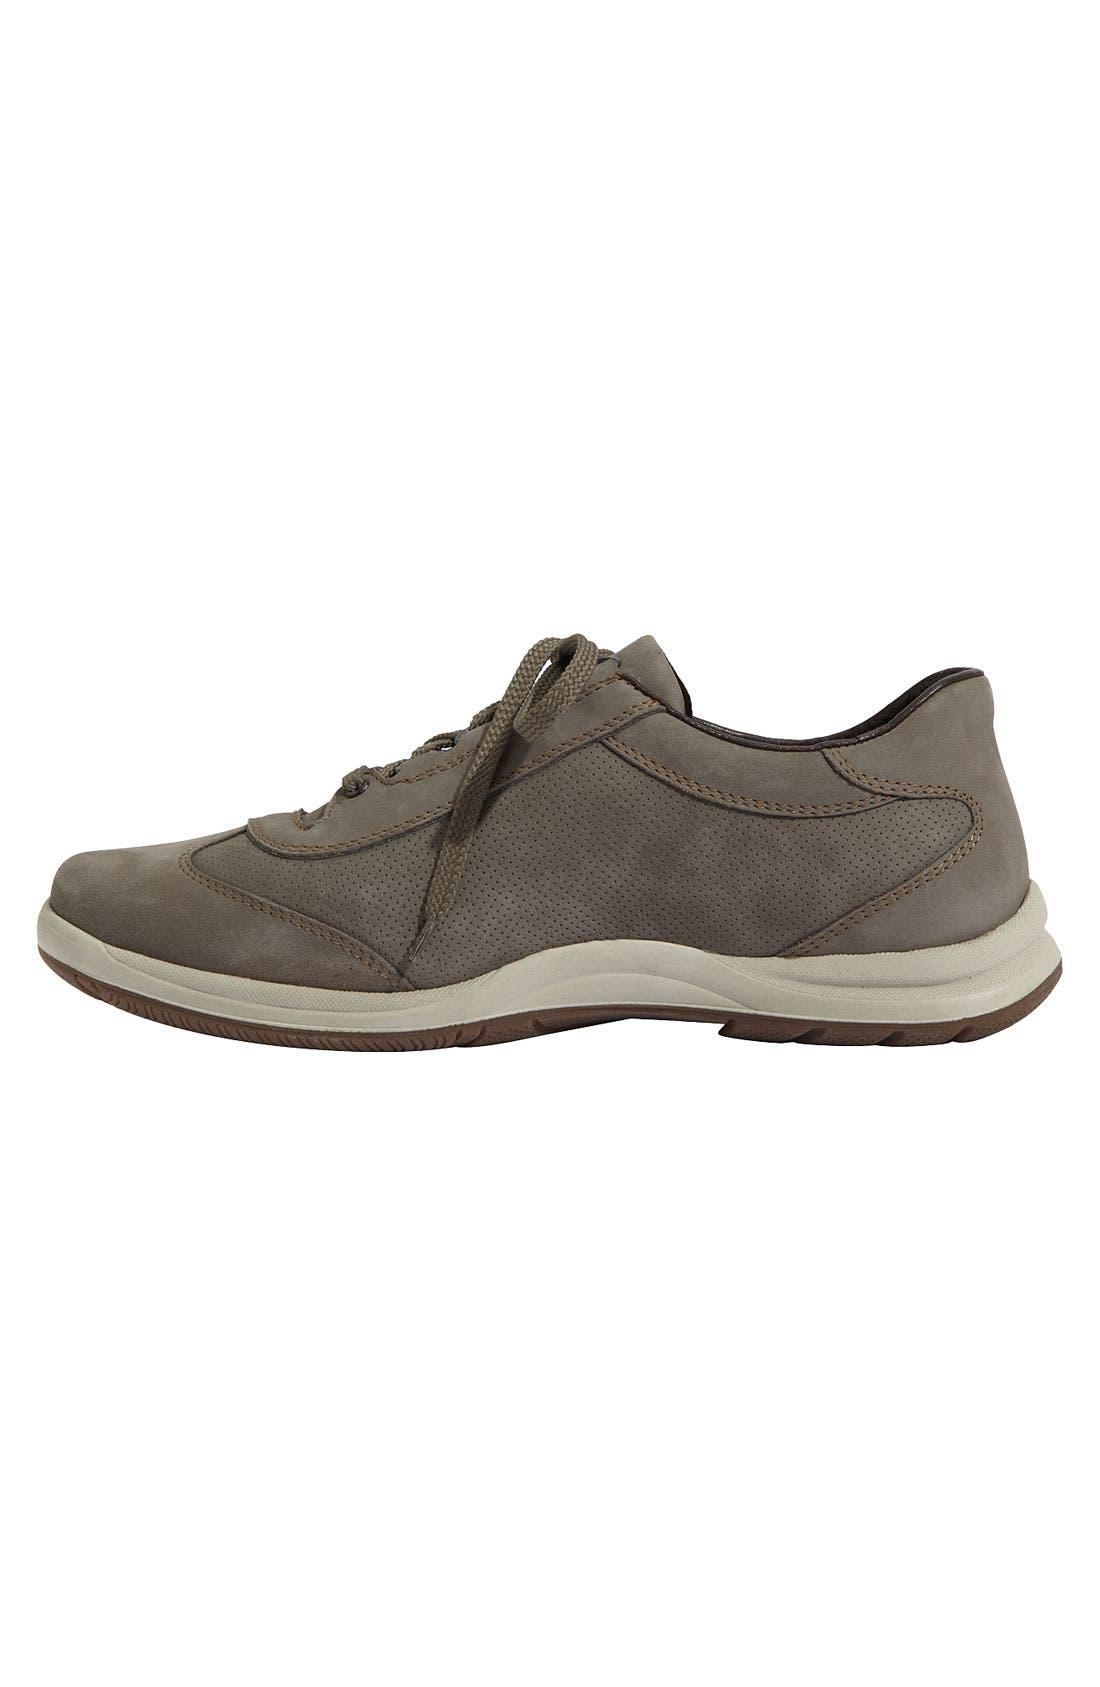 Alternate Image 2  - Mephisto 'Hike' Perforated Walking Shoe (Men)